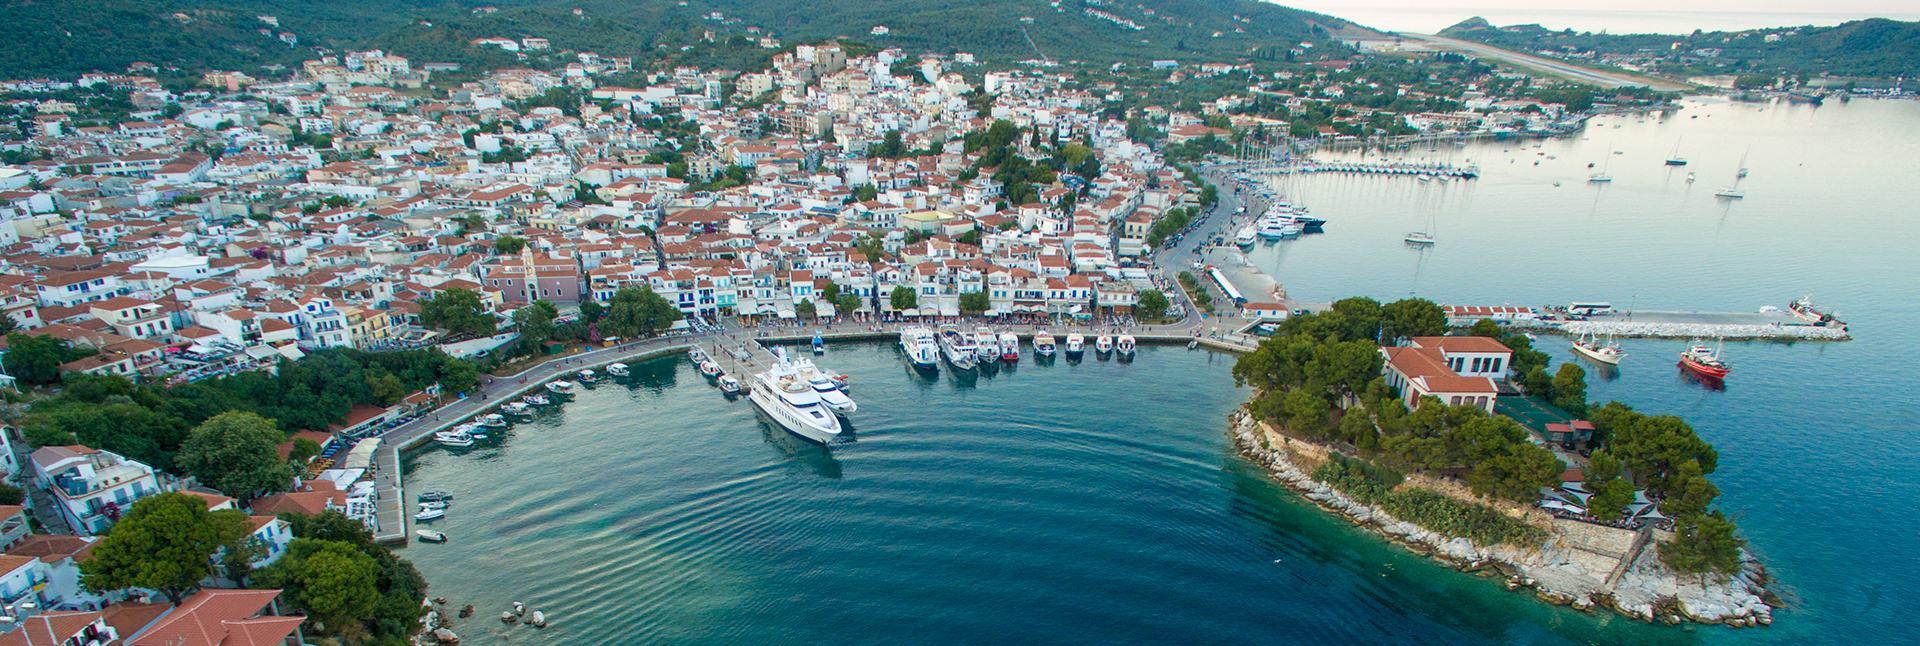 Skiathos Island - Old Port - Airport - Bourtzi - Bourtzi Boutique Hotel